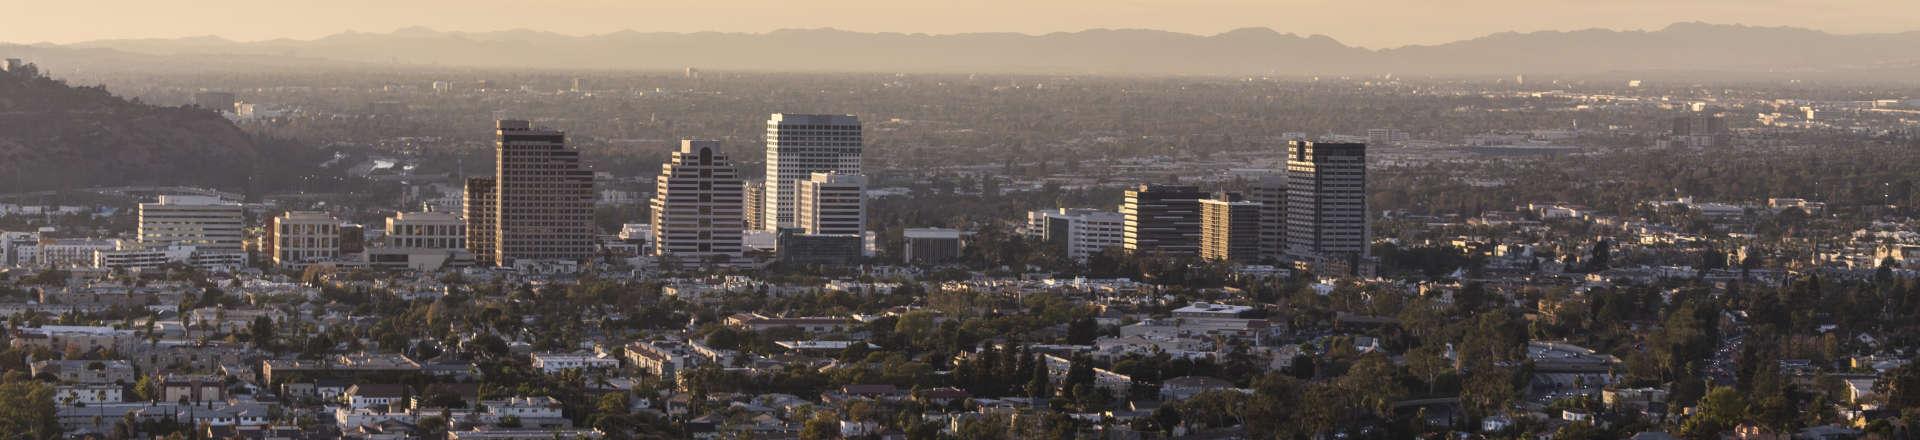 panoramic view of Glendale, CA